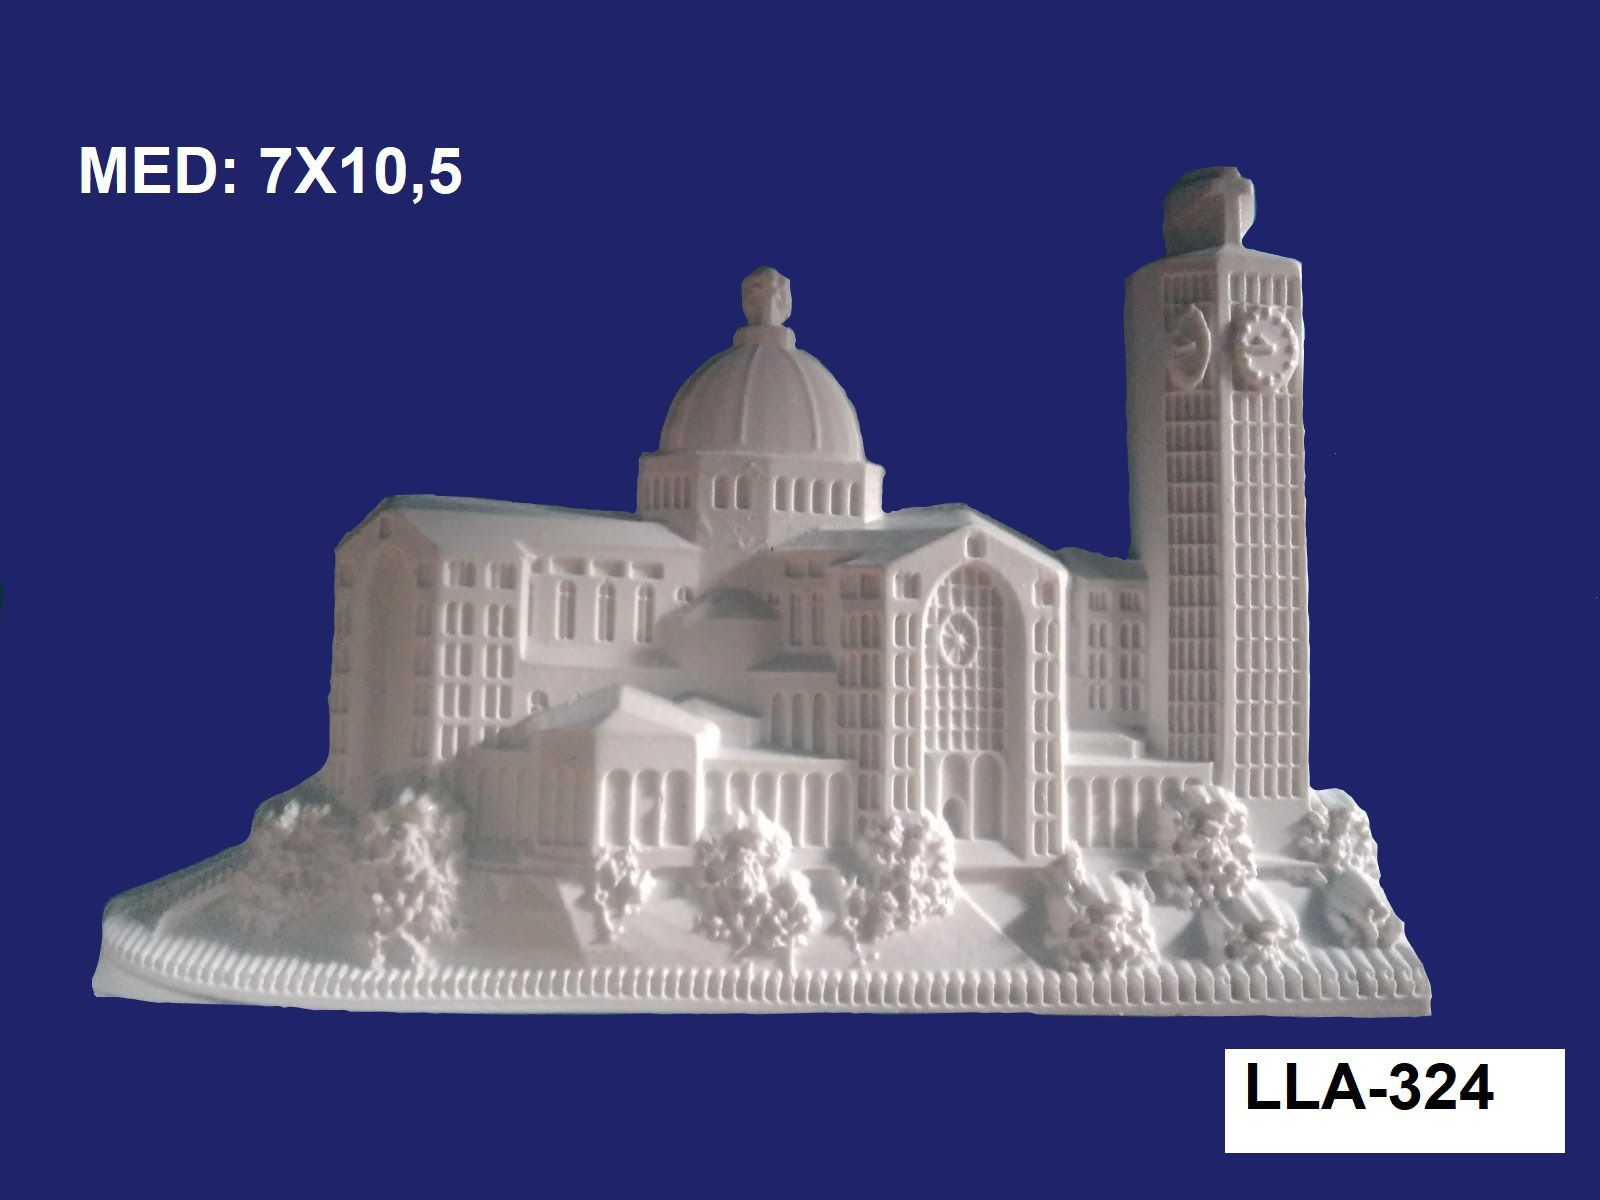 LLA-324 APLIQUE BASILICA DE APARECIDA 7X10,5CM